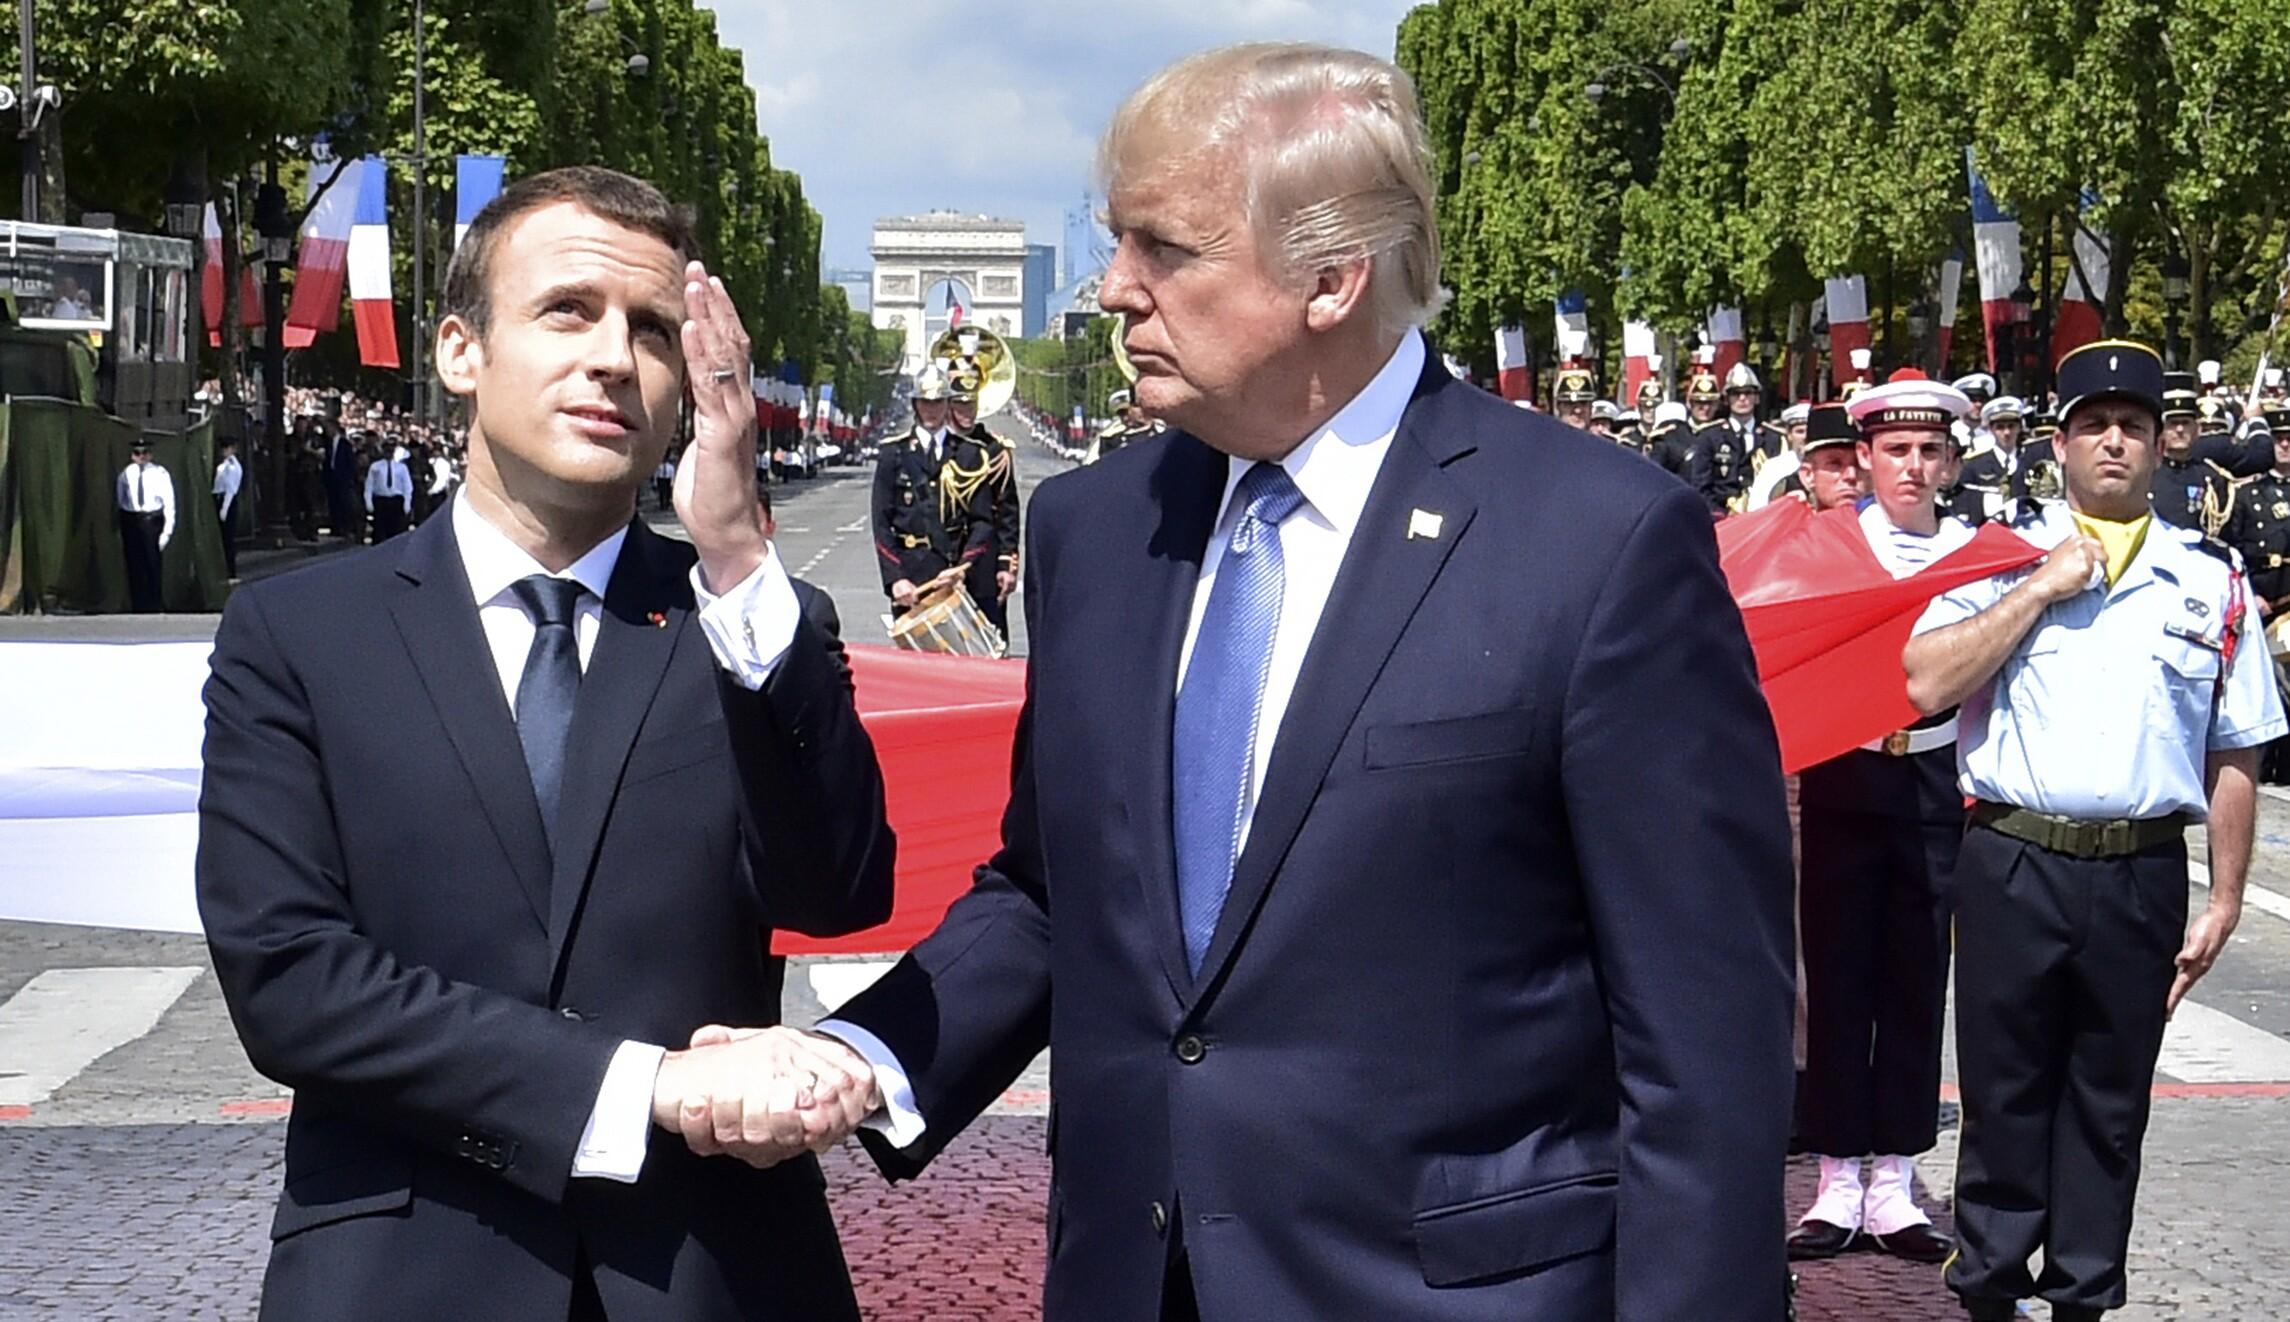 Trump French President Emmanuel Macron Loves Holding My Hand